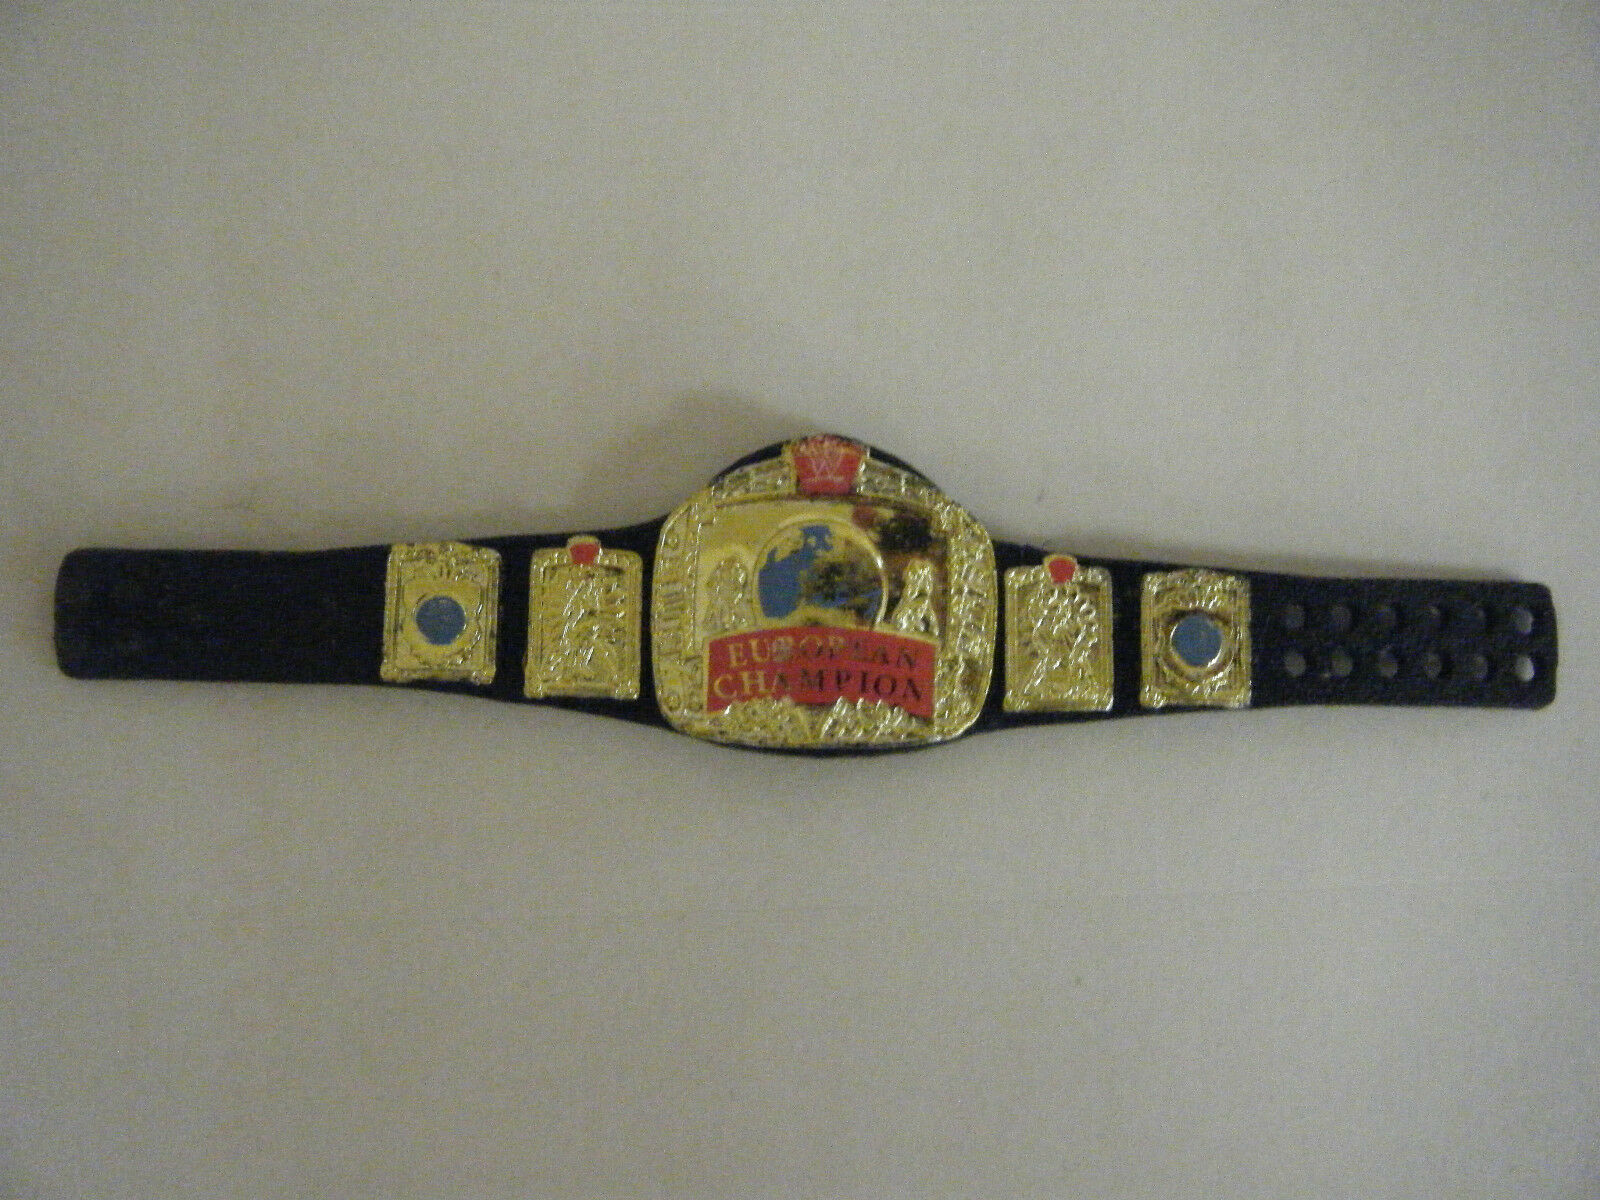 ELITE EUROPEAN OLD WWF WRESTLING WWE MATTEL CHAMPIONSHIP BELT ACCESSORIES FIGURE